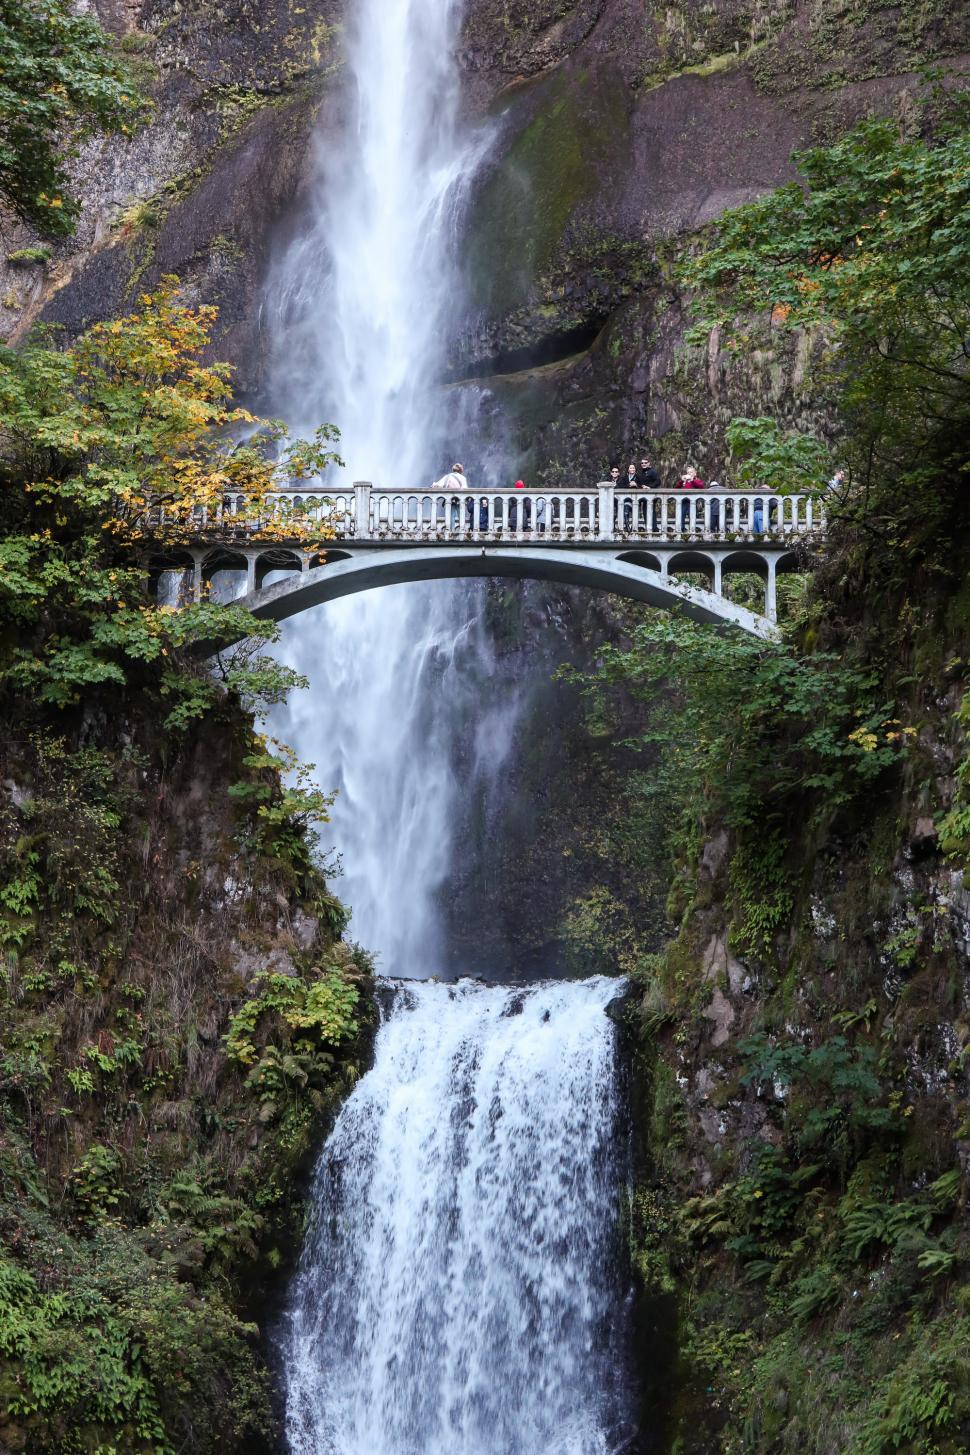 Download Free Stock HD Photo of Bridgeat Multnomah Falls, Pacific Northwest, Oregon, USA Online